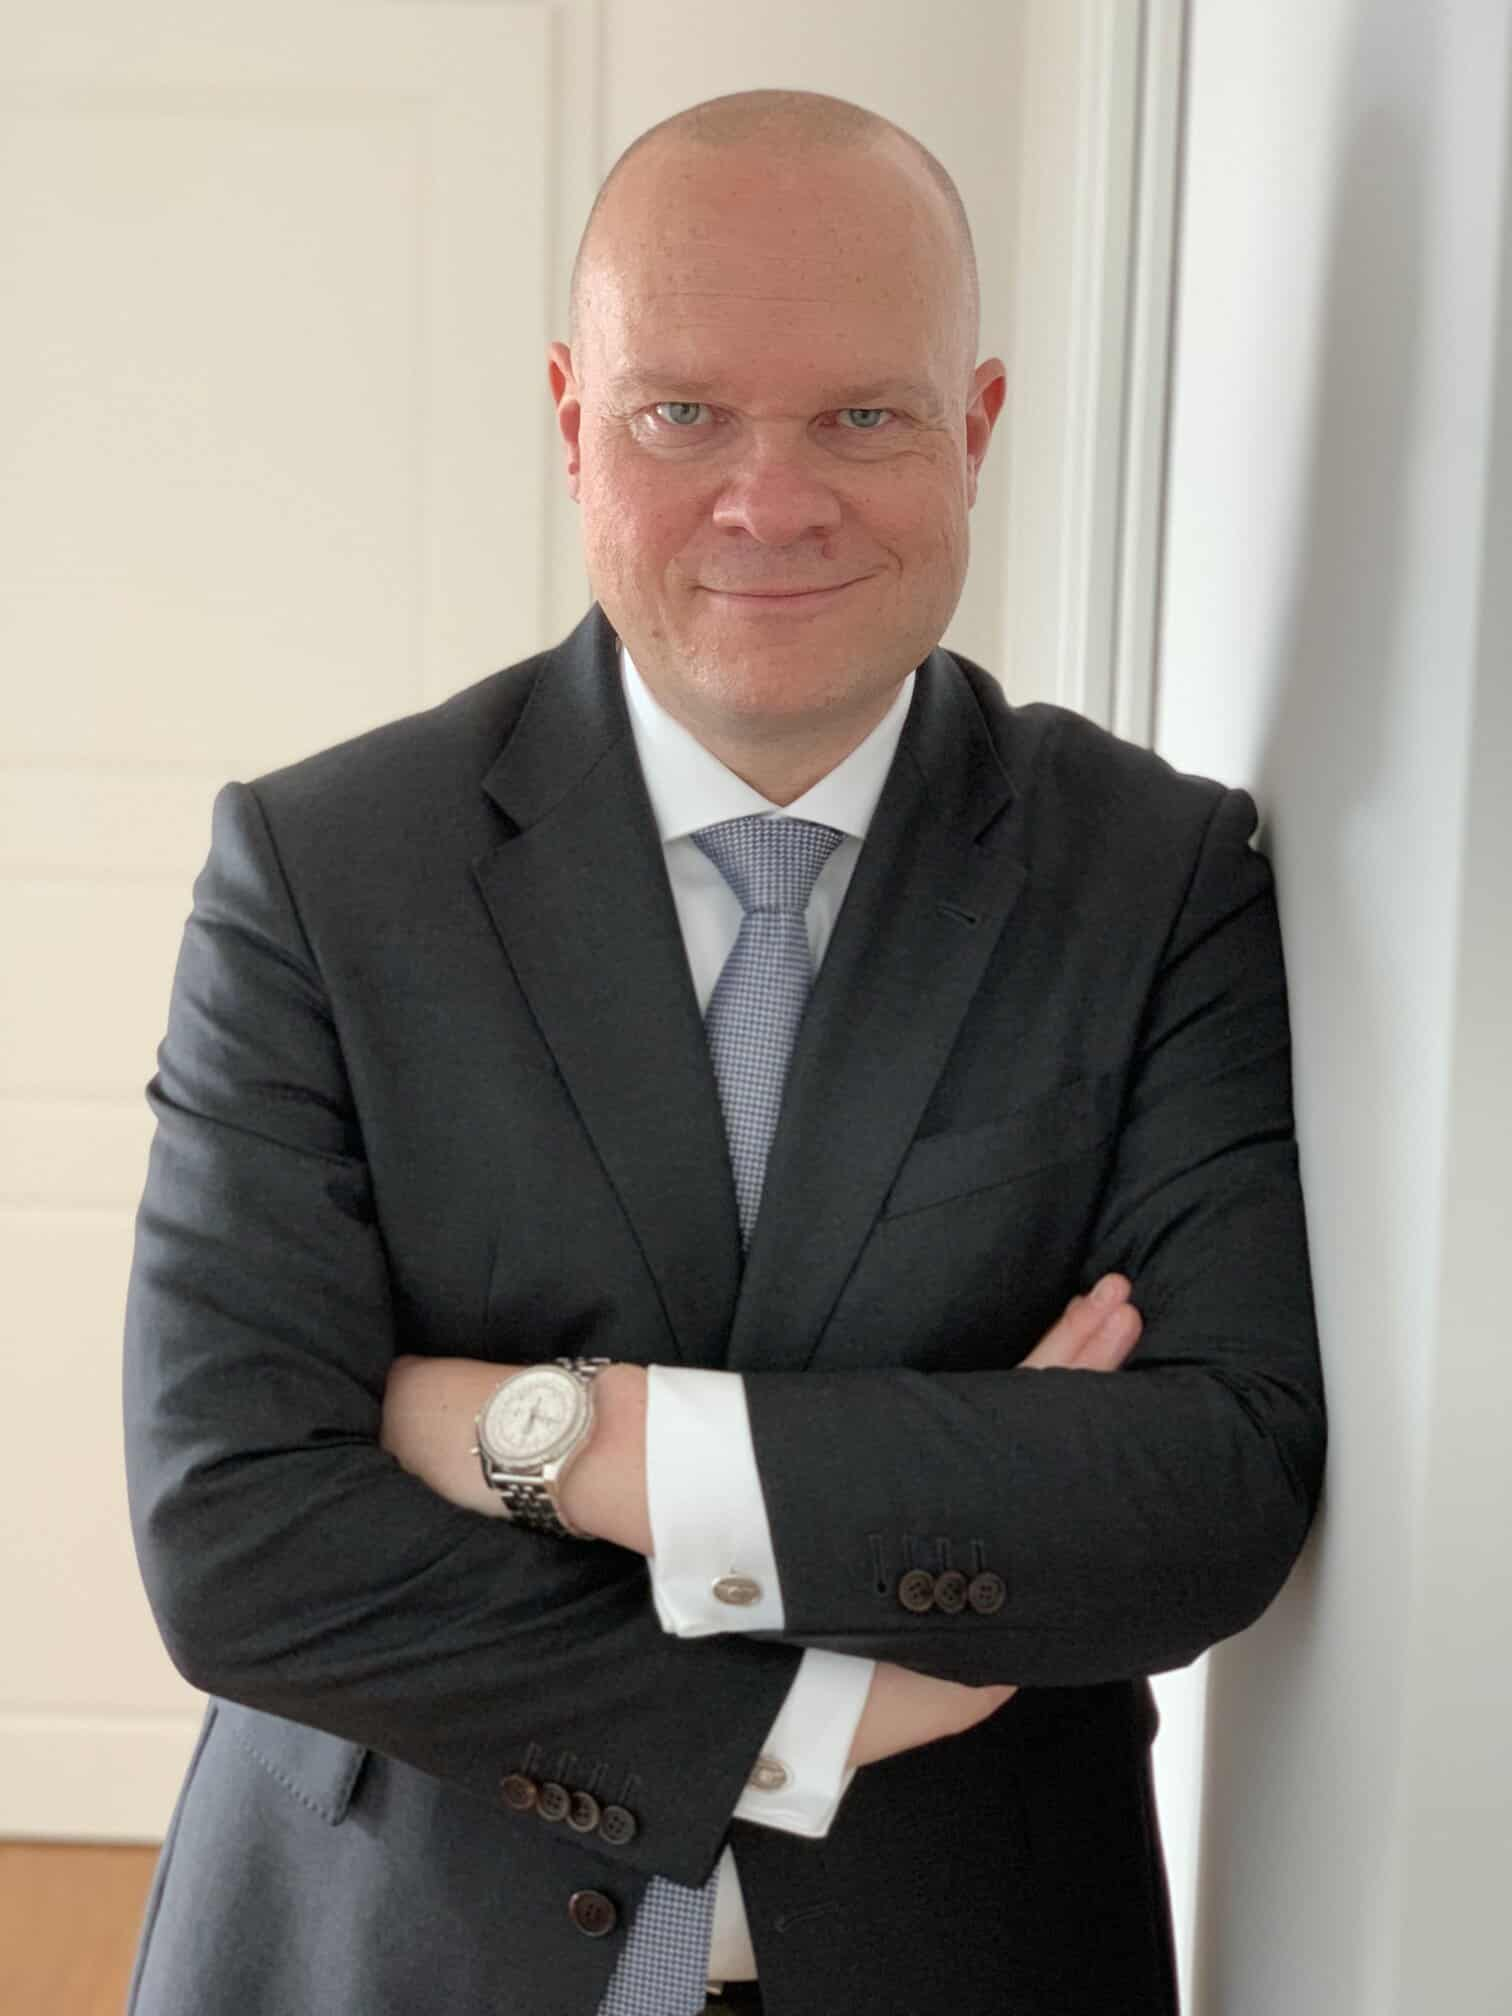 rsz pm ssh bild - Dr. Sascha Schuth new partner at TARGUS